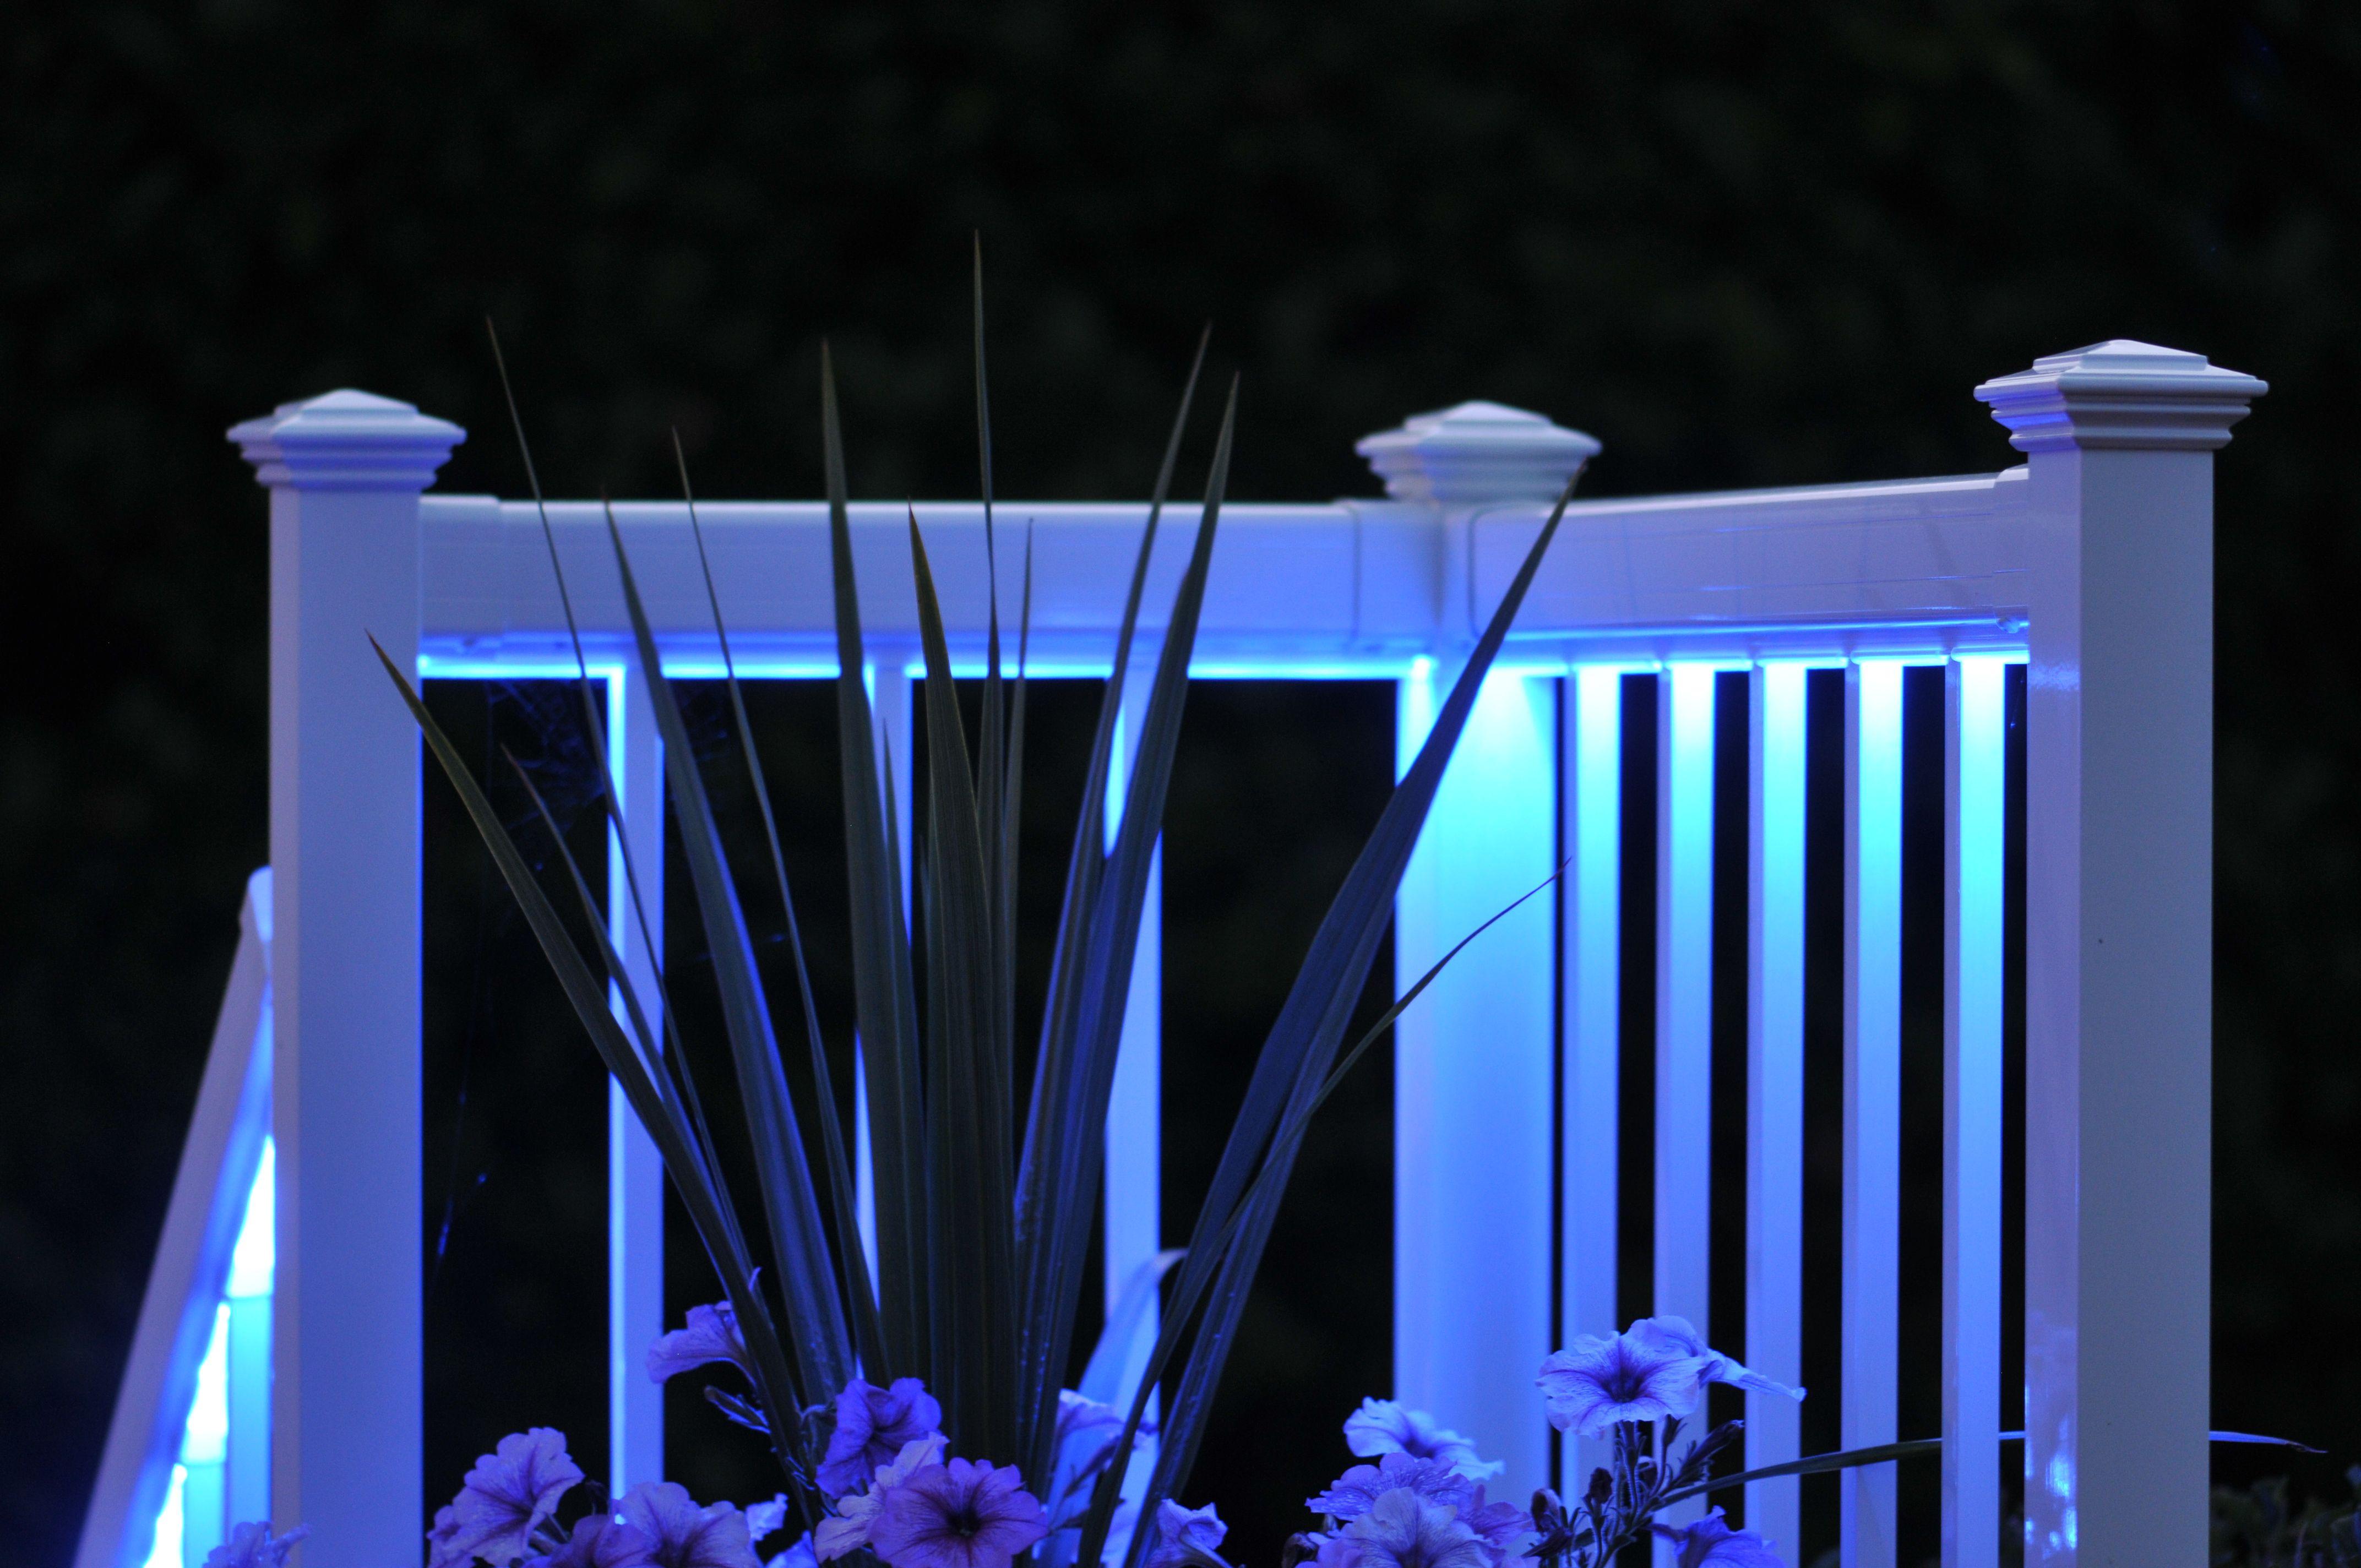 regal ideas led lit railing system regalideas lighting